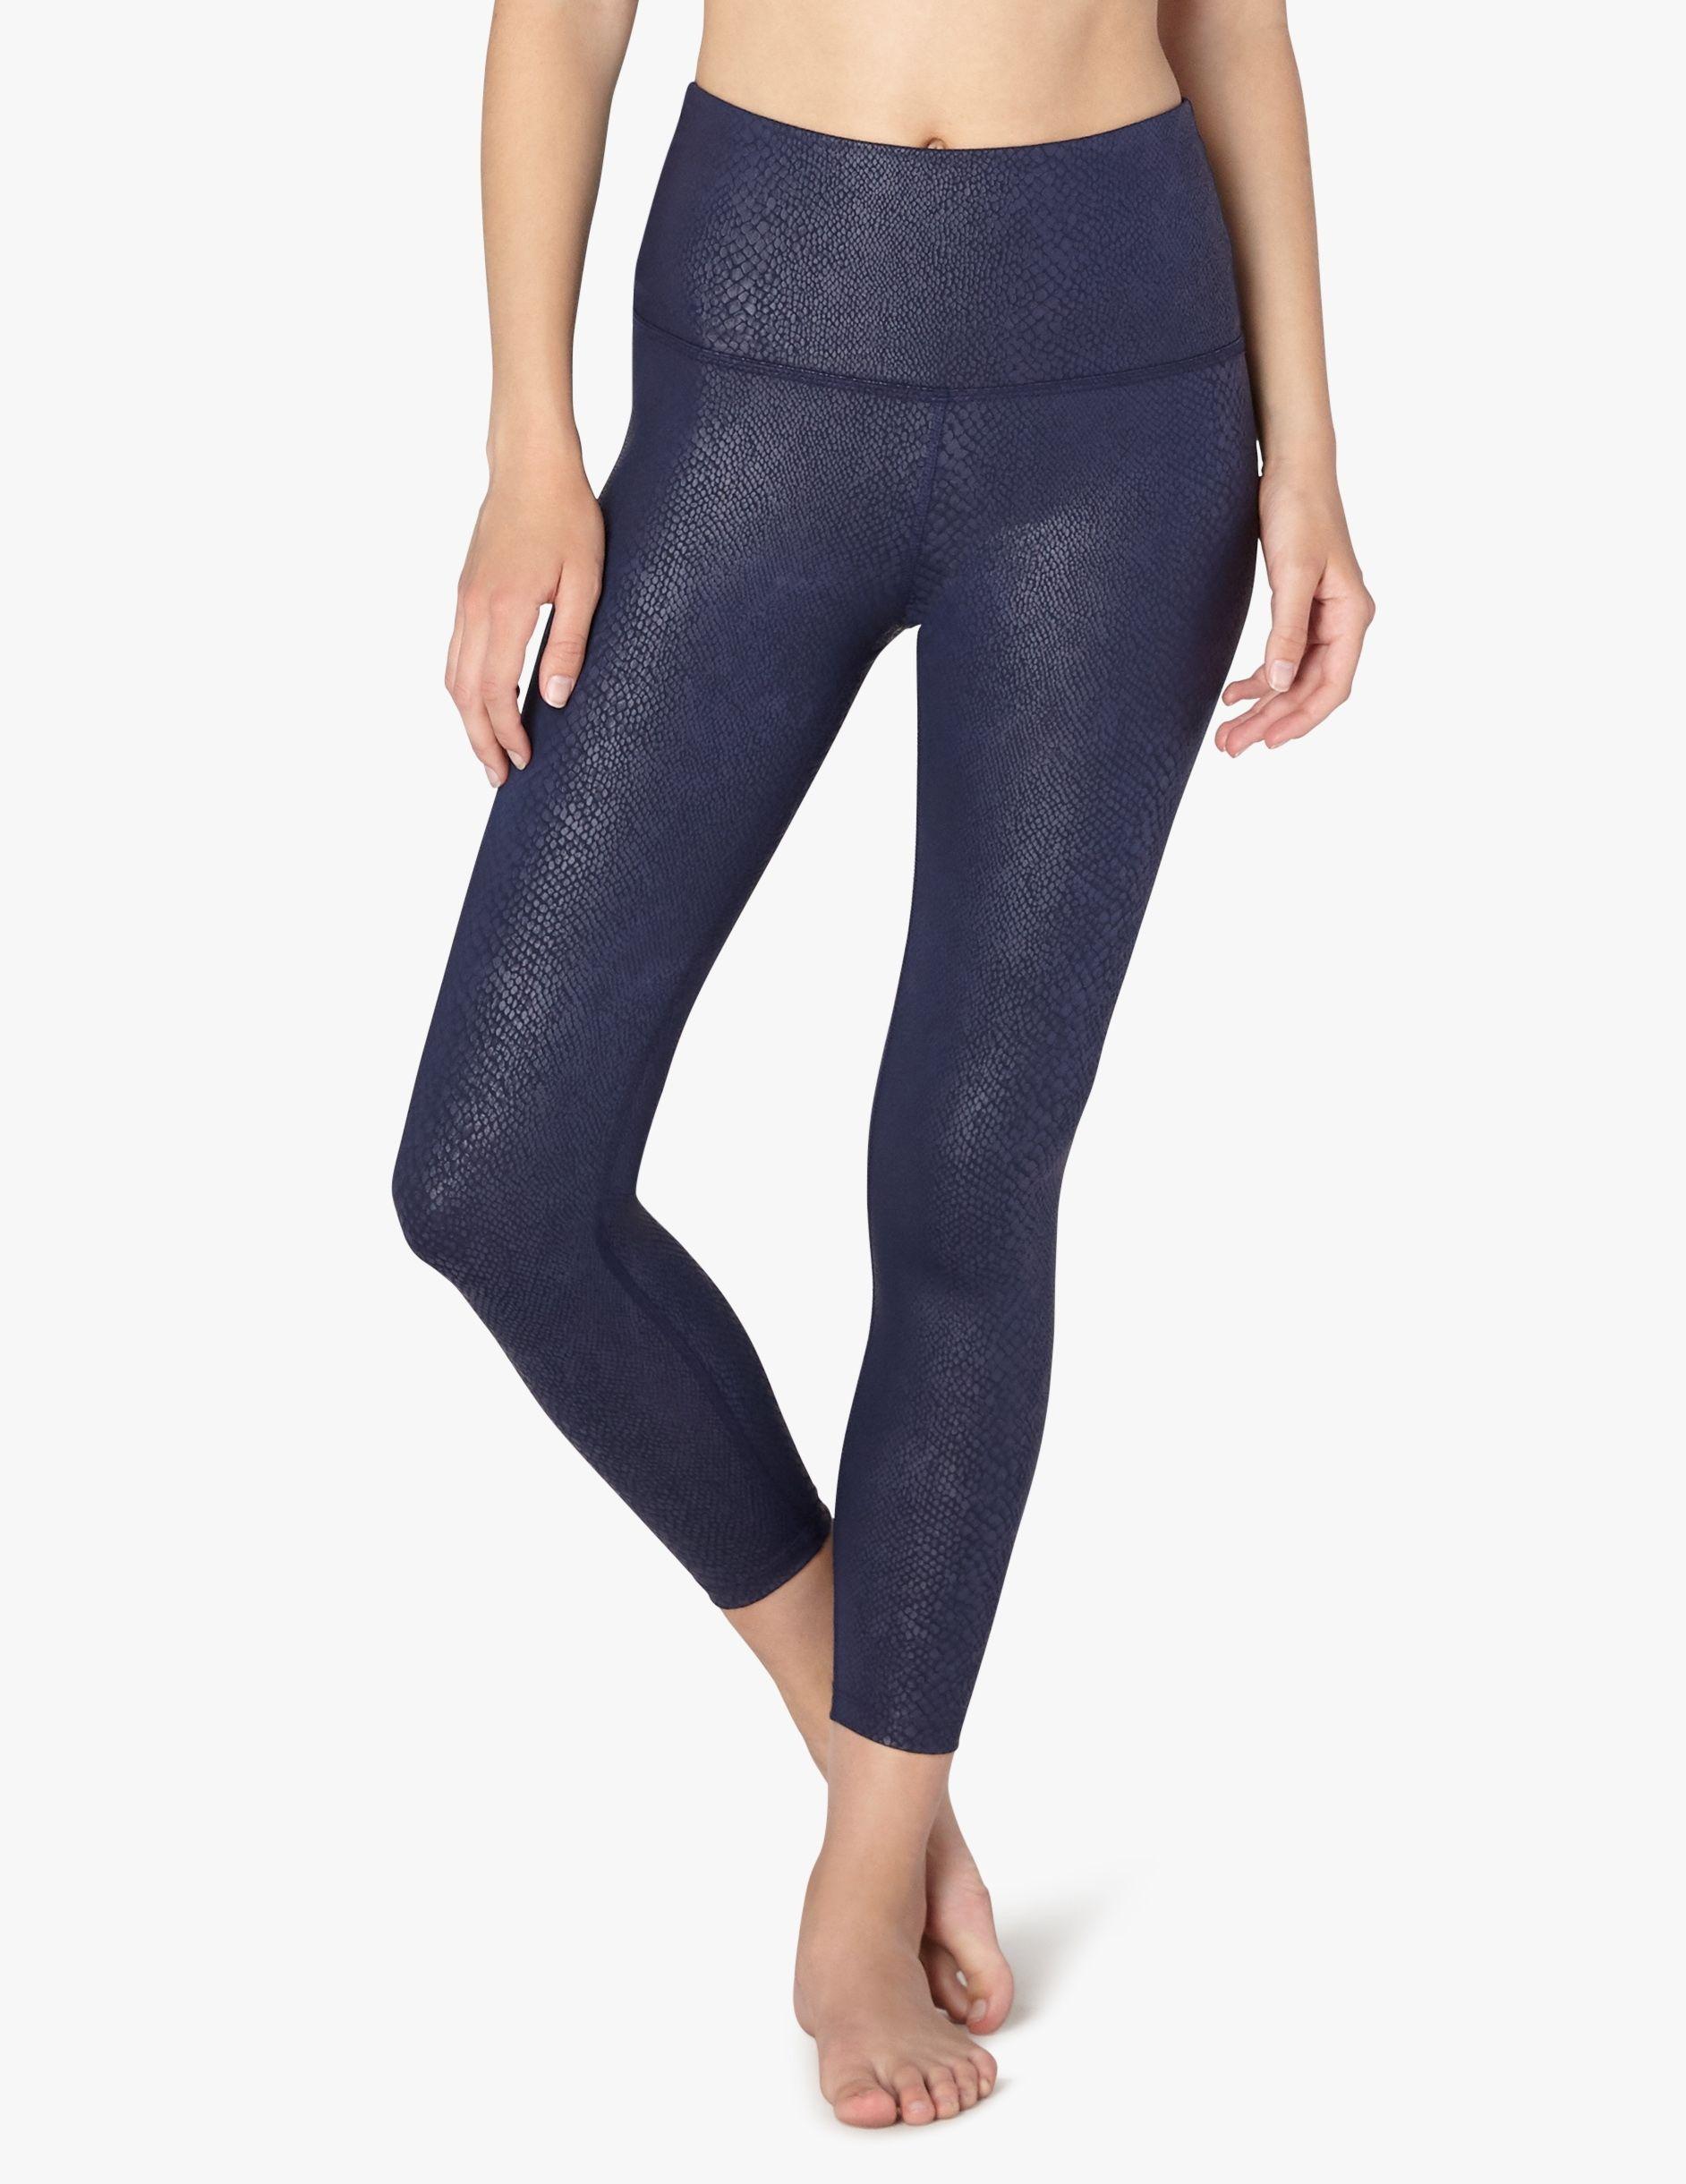 4aca835a09669 Beyond Yoga Viper High Waisted Midi Legging | Activewear + Fitness ...